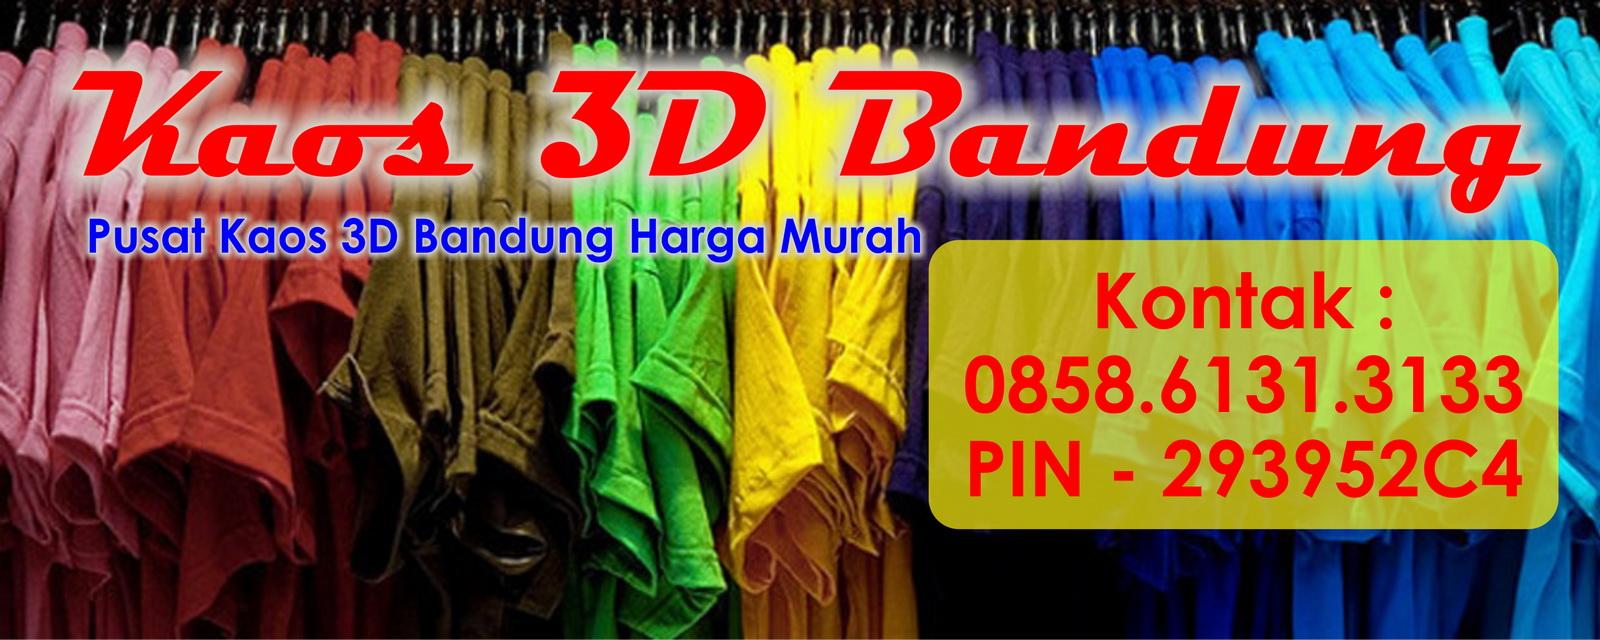 Kaos 3 Dimensi Bandung | PIN 293952C4